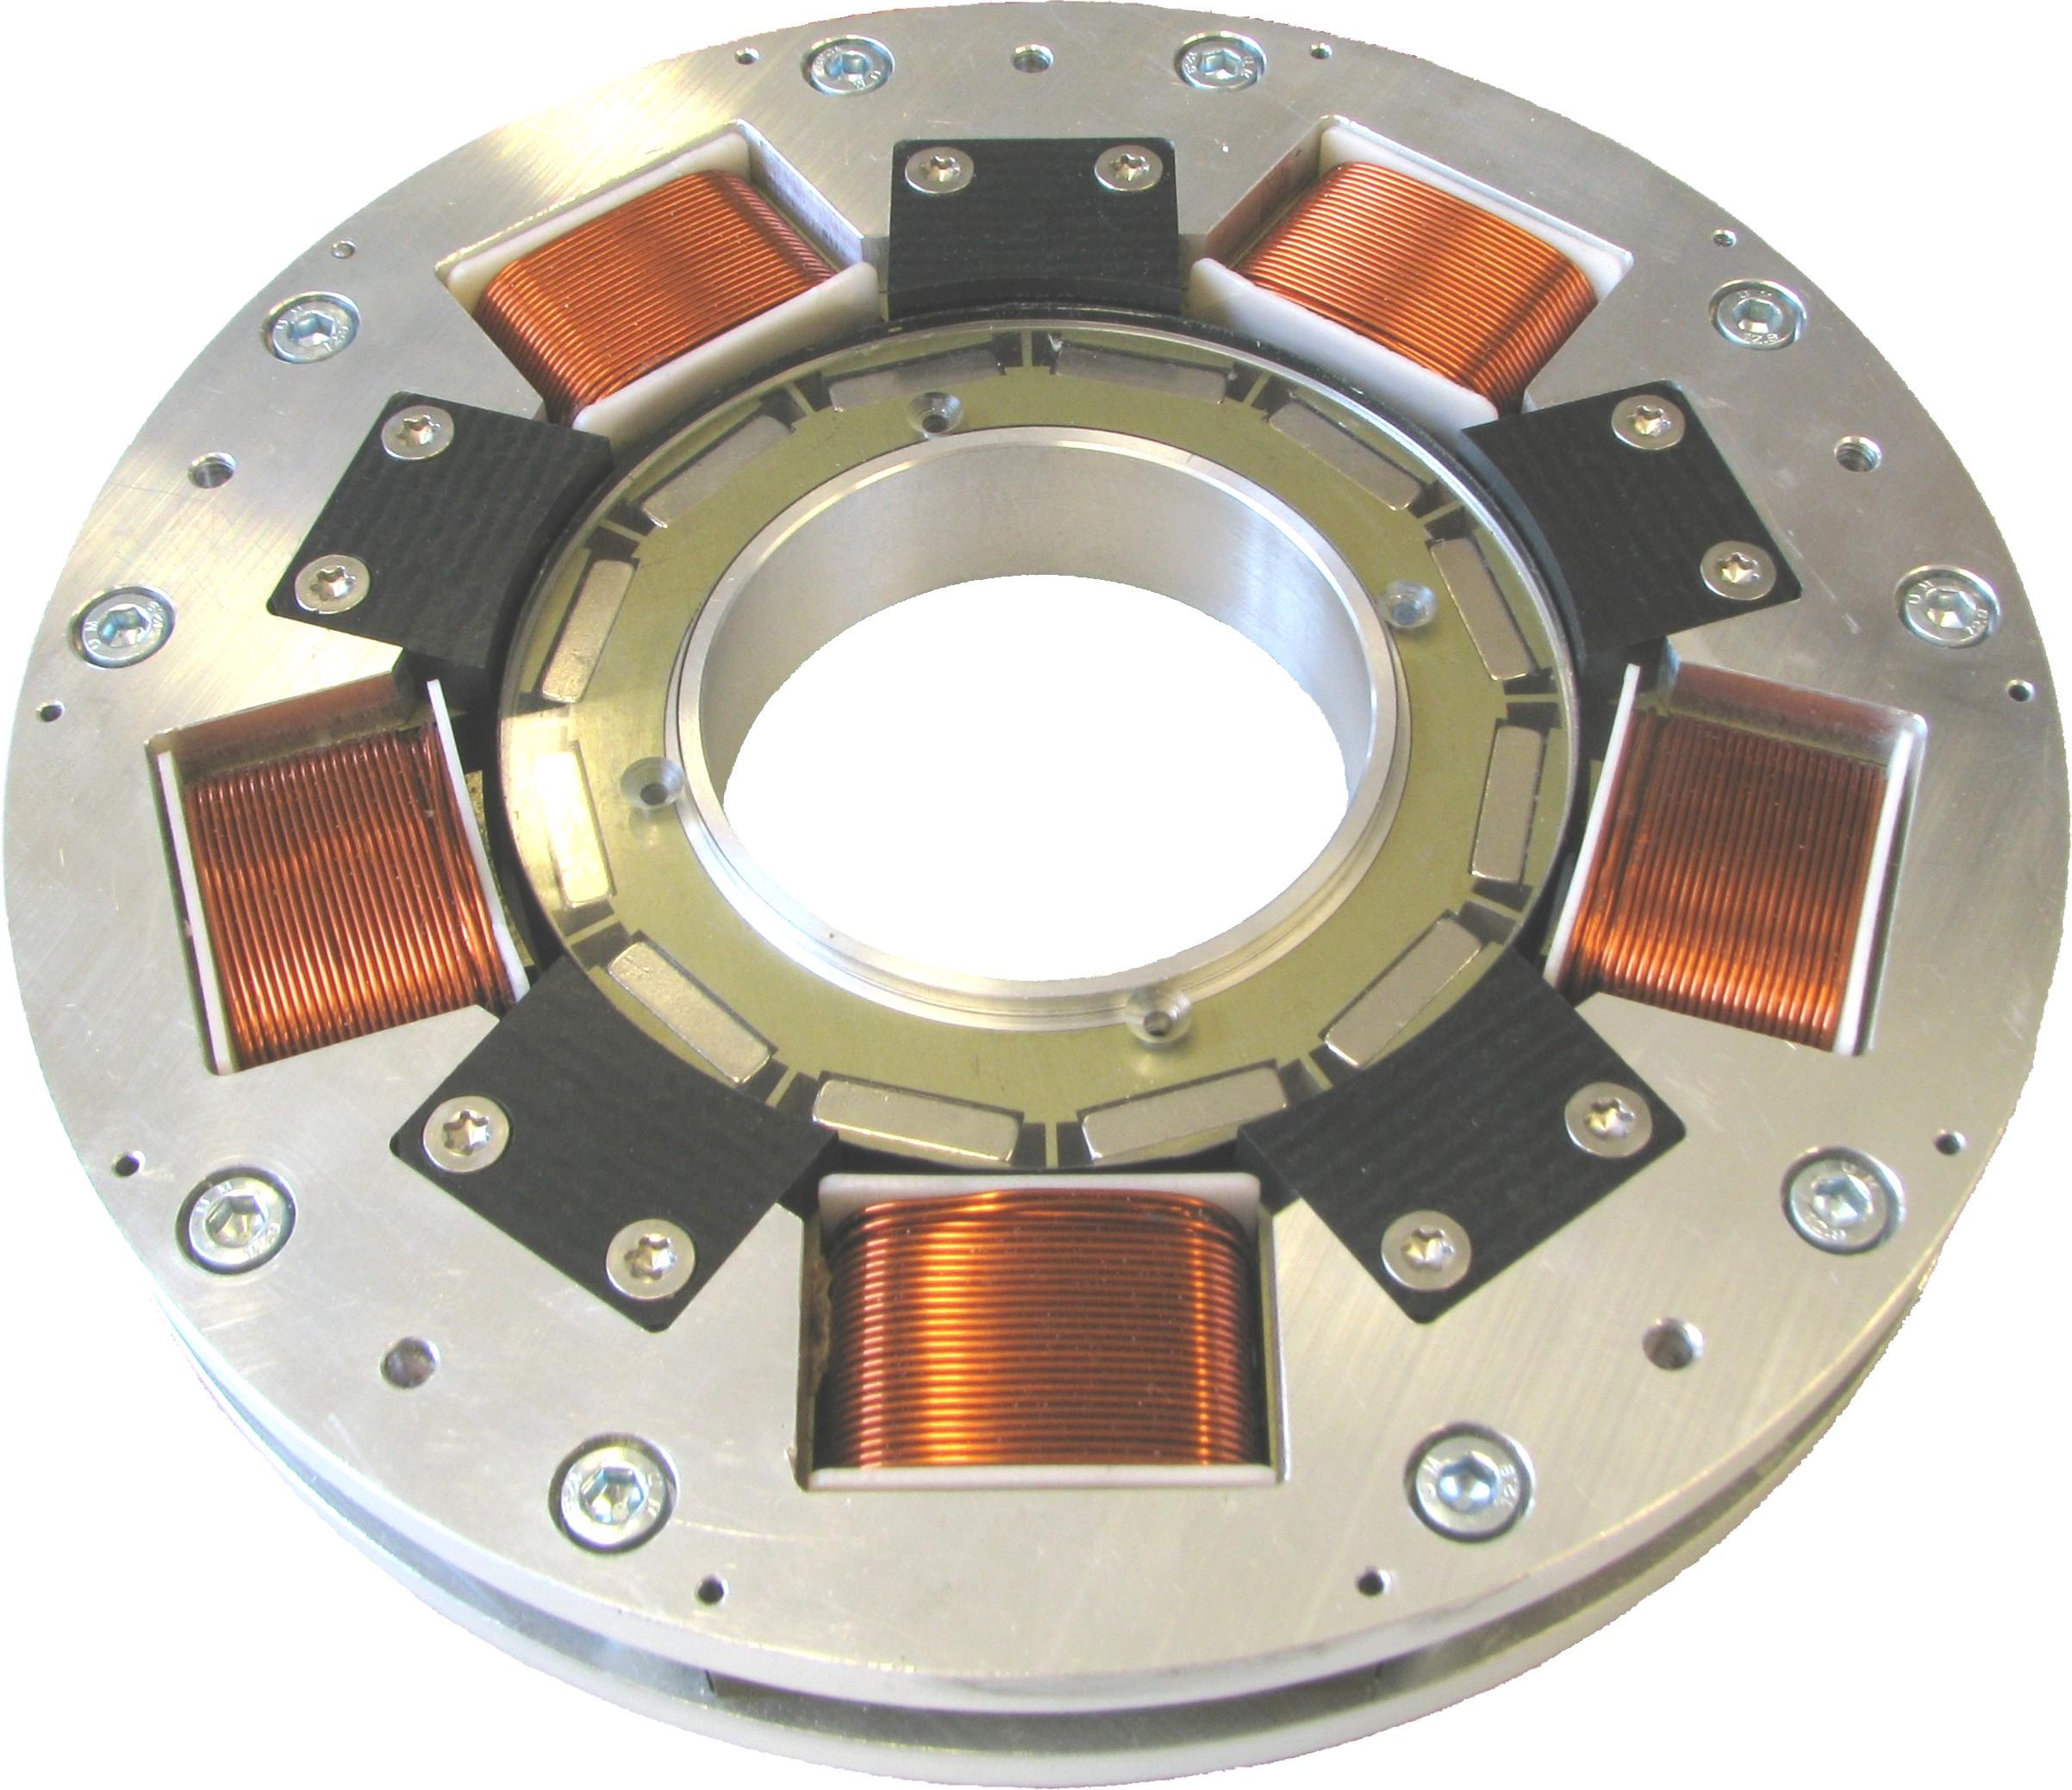 magnetic bearing, Wofgang Gruber Institu